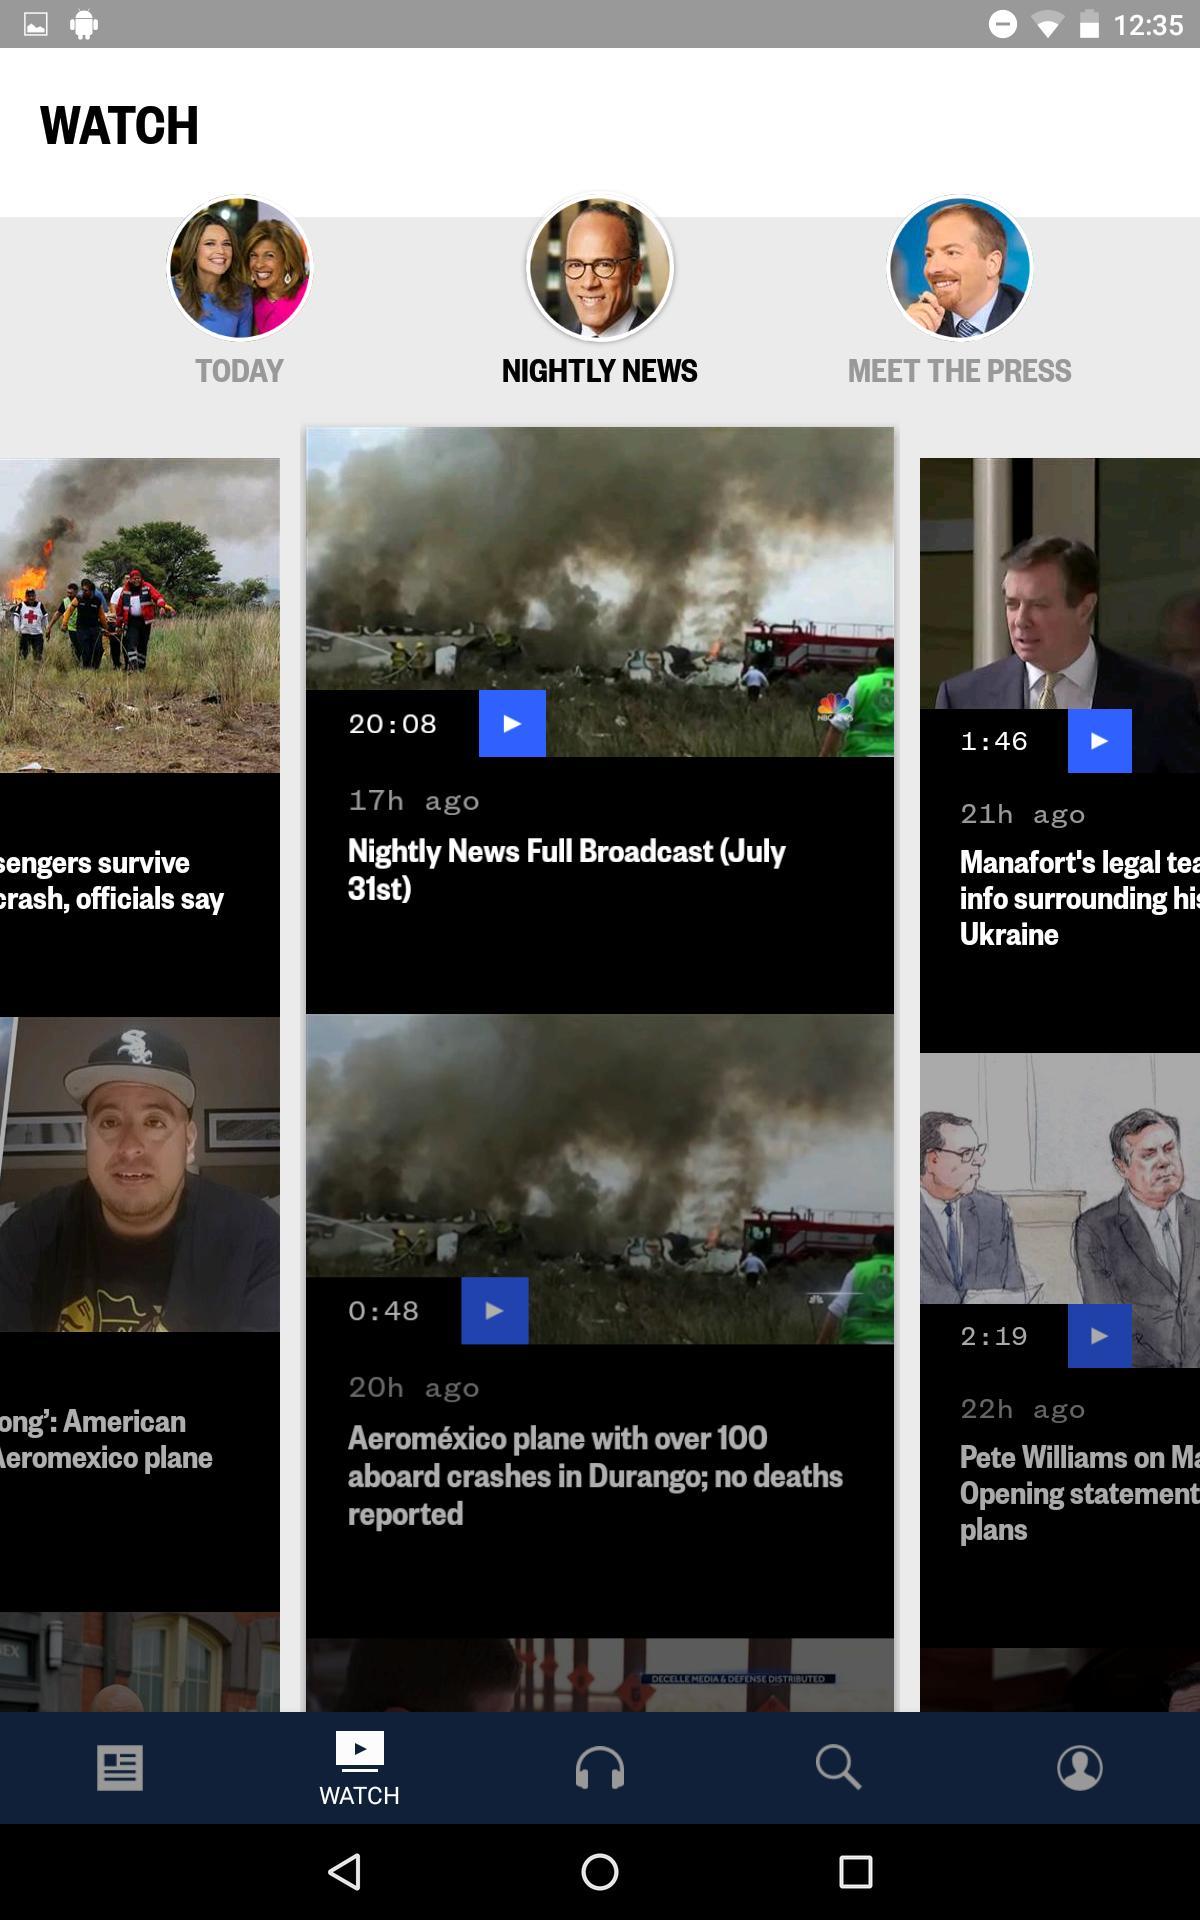 NBC News: Breaking News, US News & Live Video 6.0.11 Screenshot 13